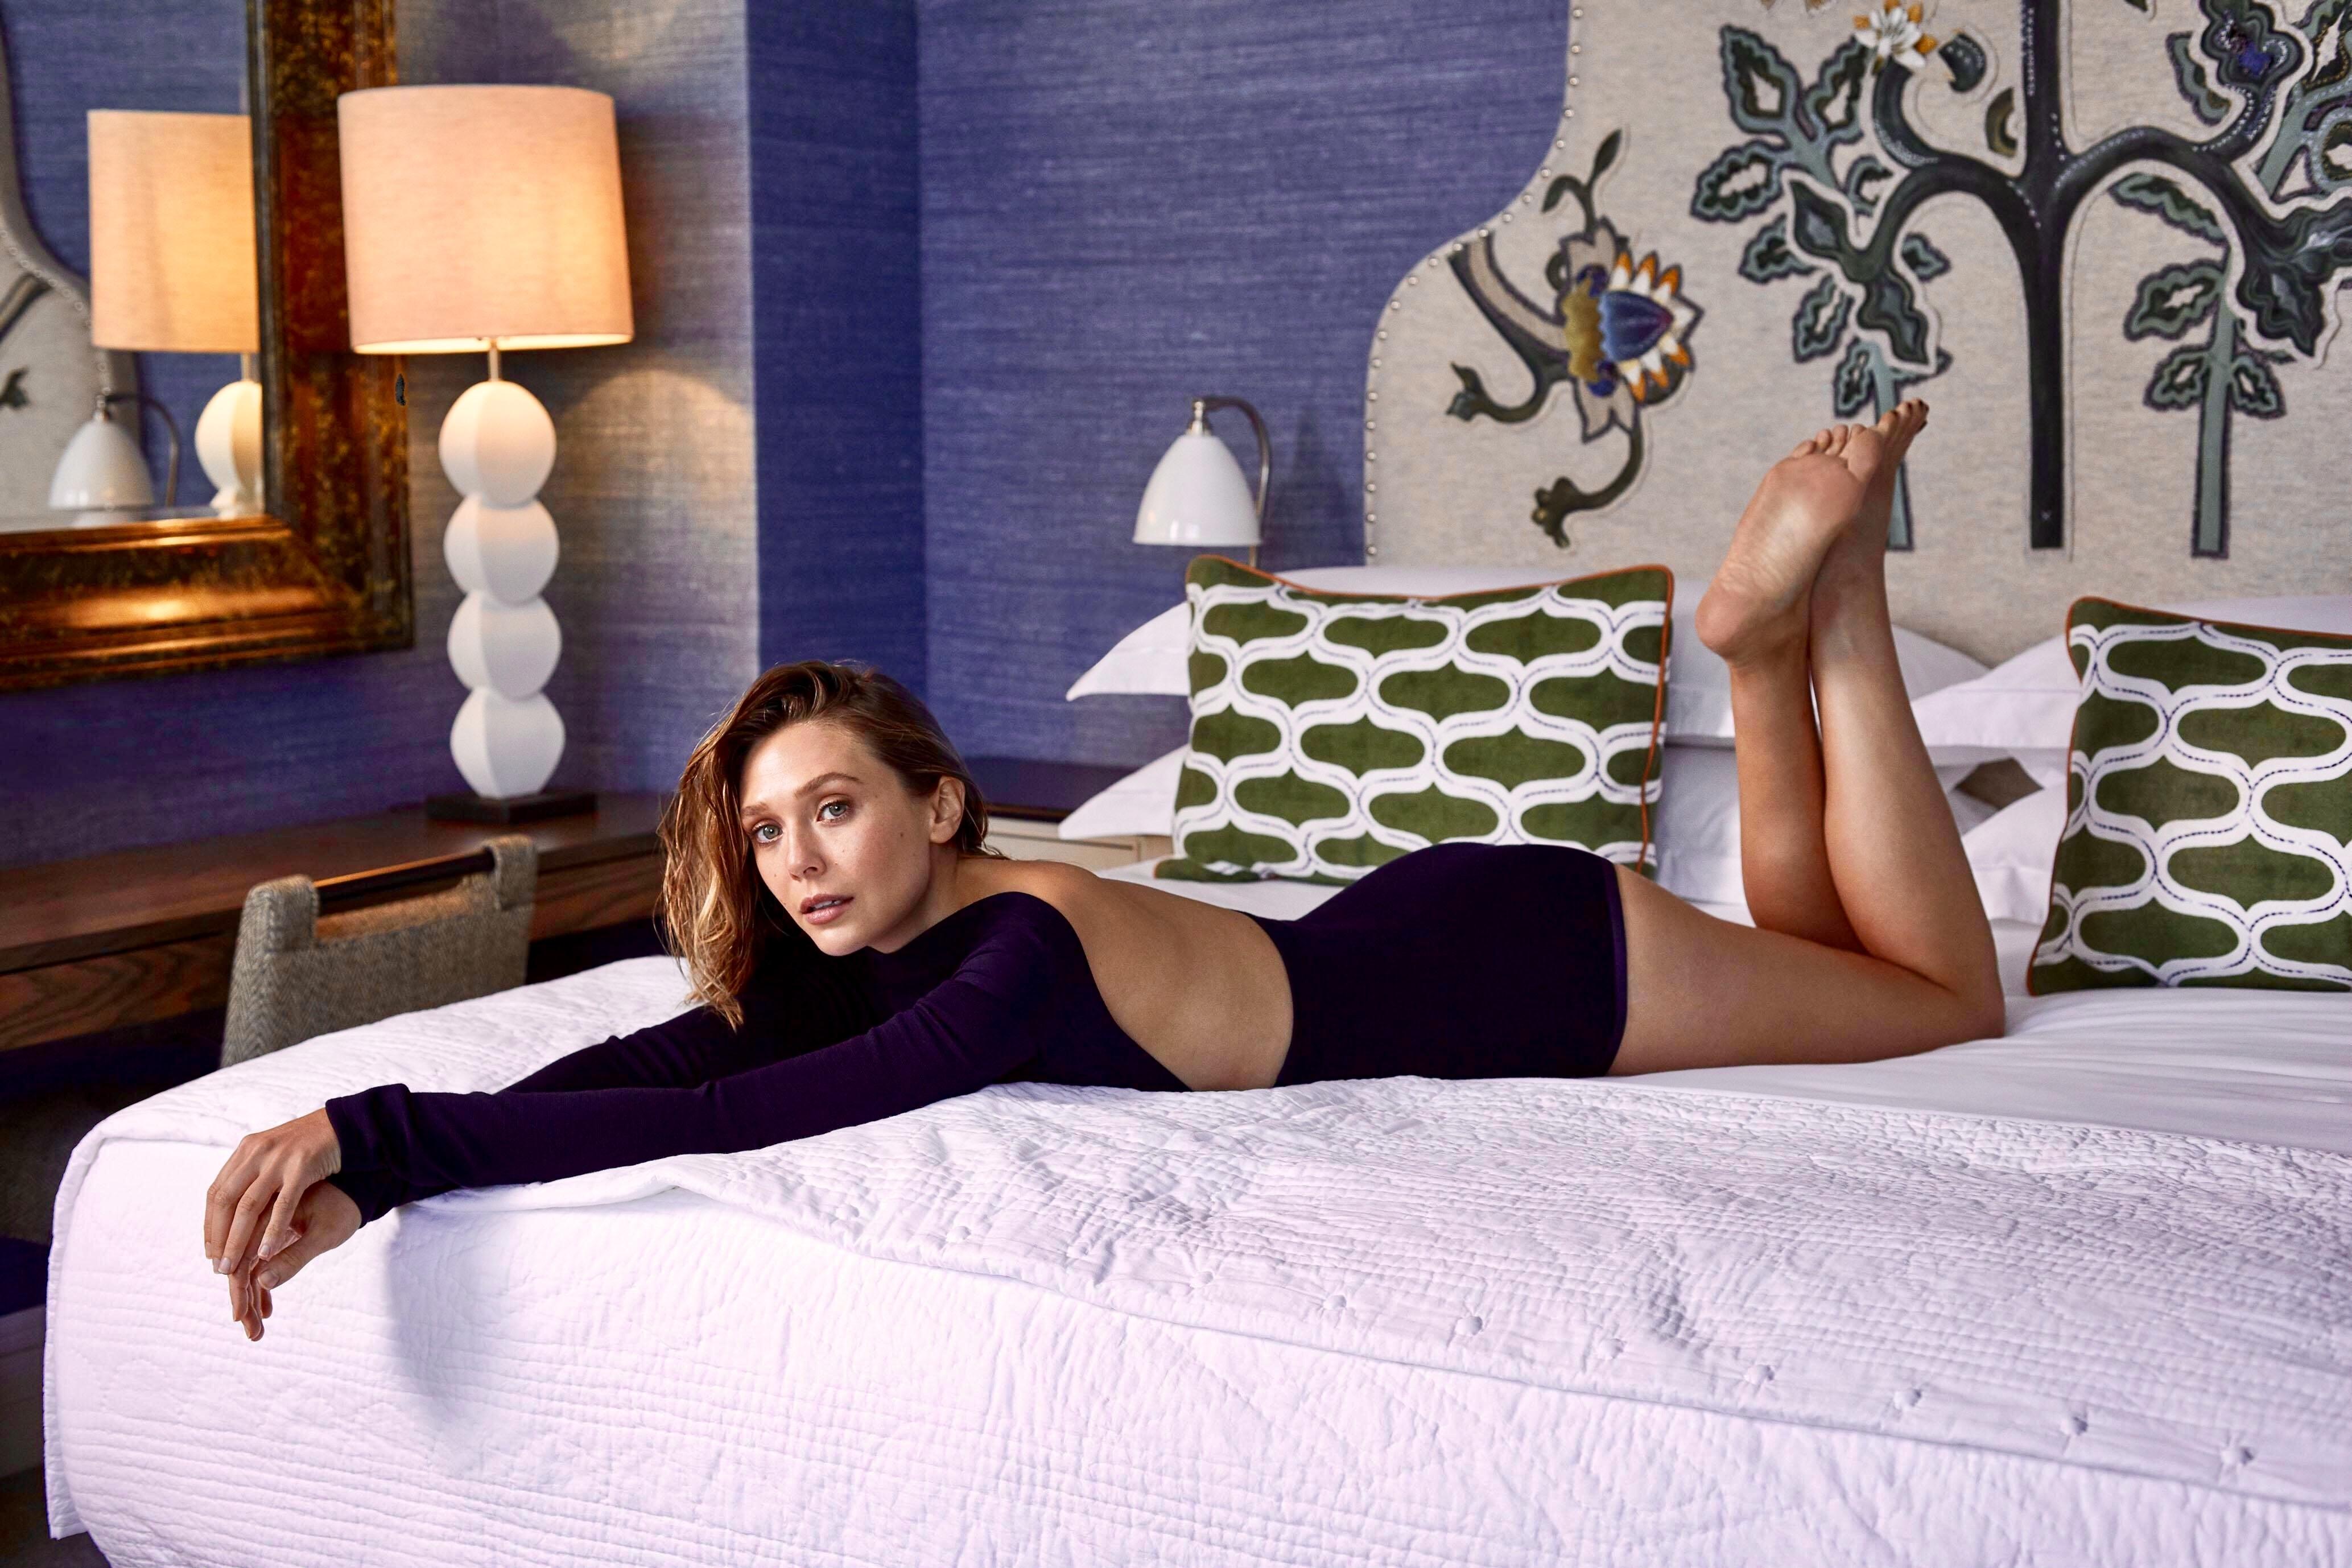 Feet Halsey Braless nudes (85 photo), Tits, Hot, Feet, cameltoe 2006